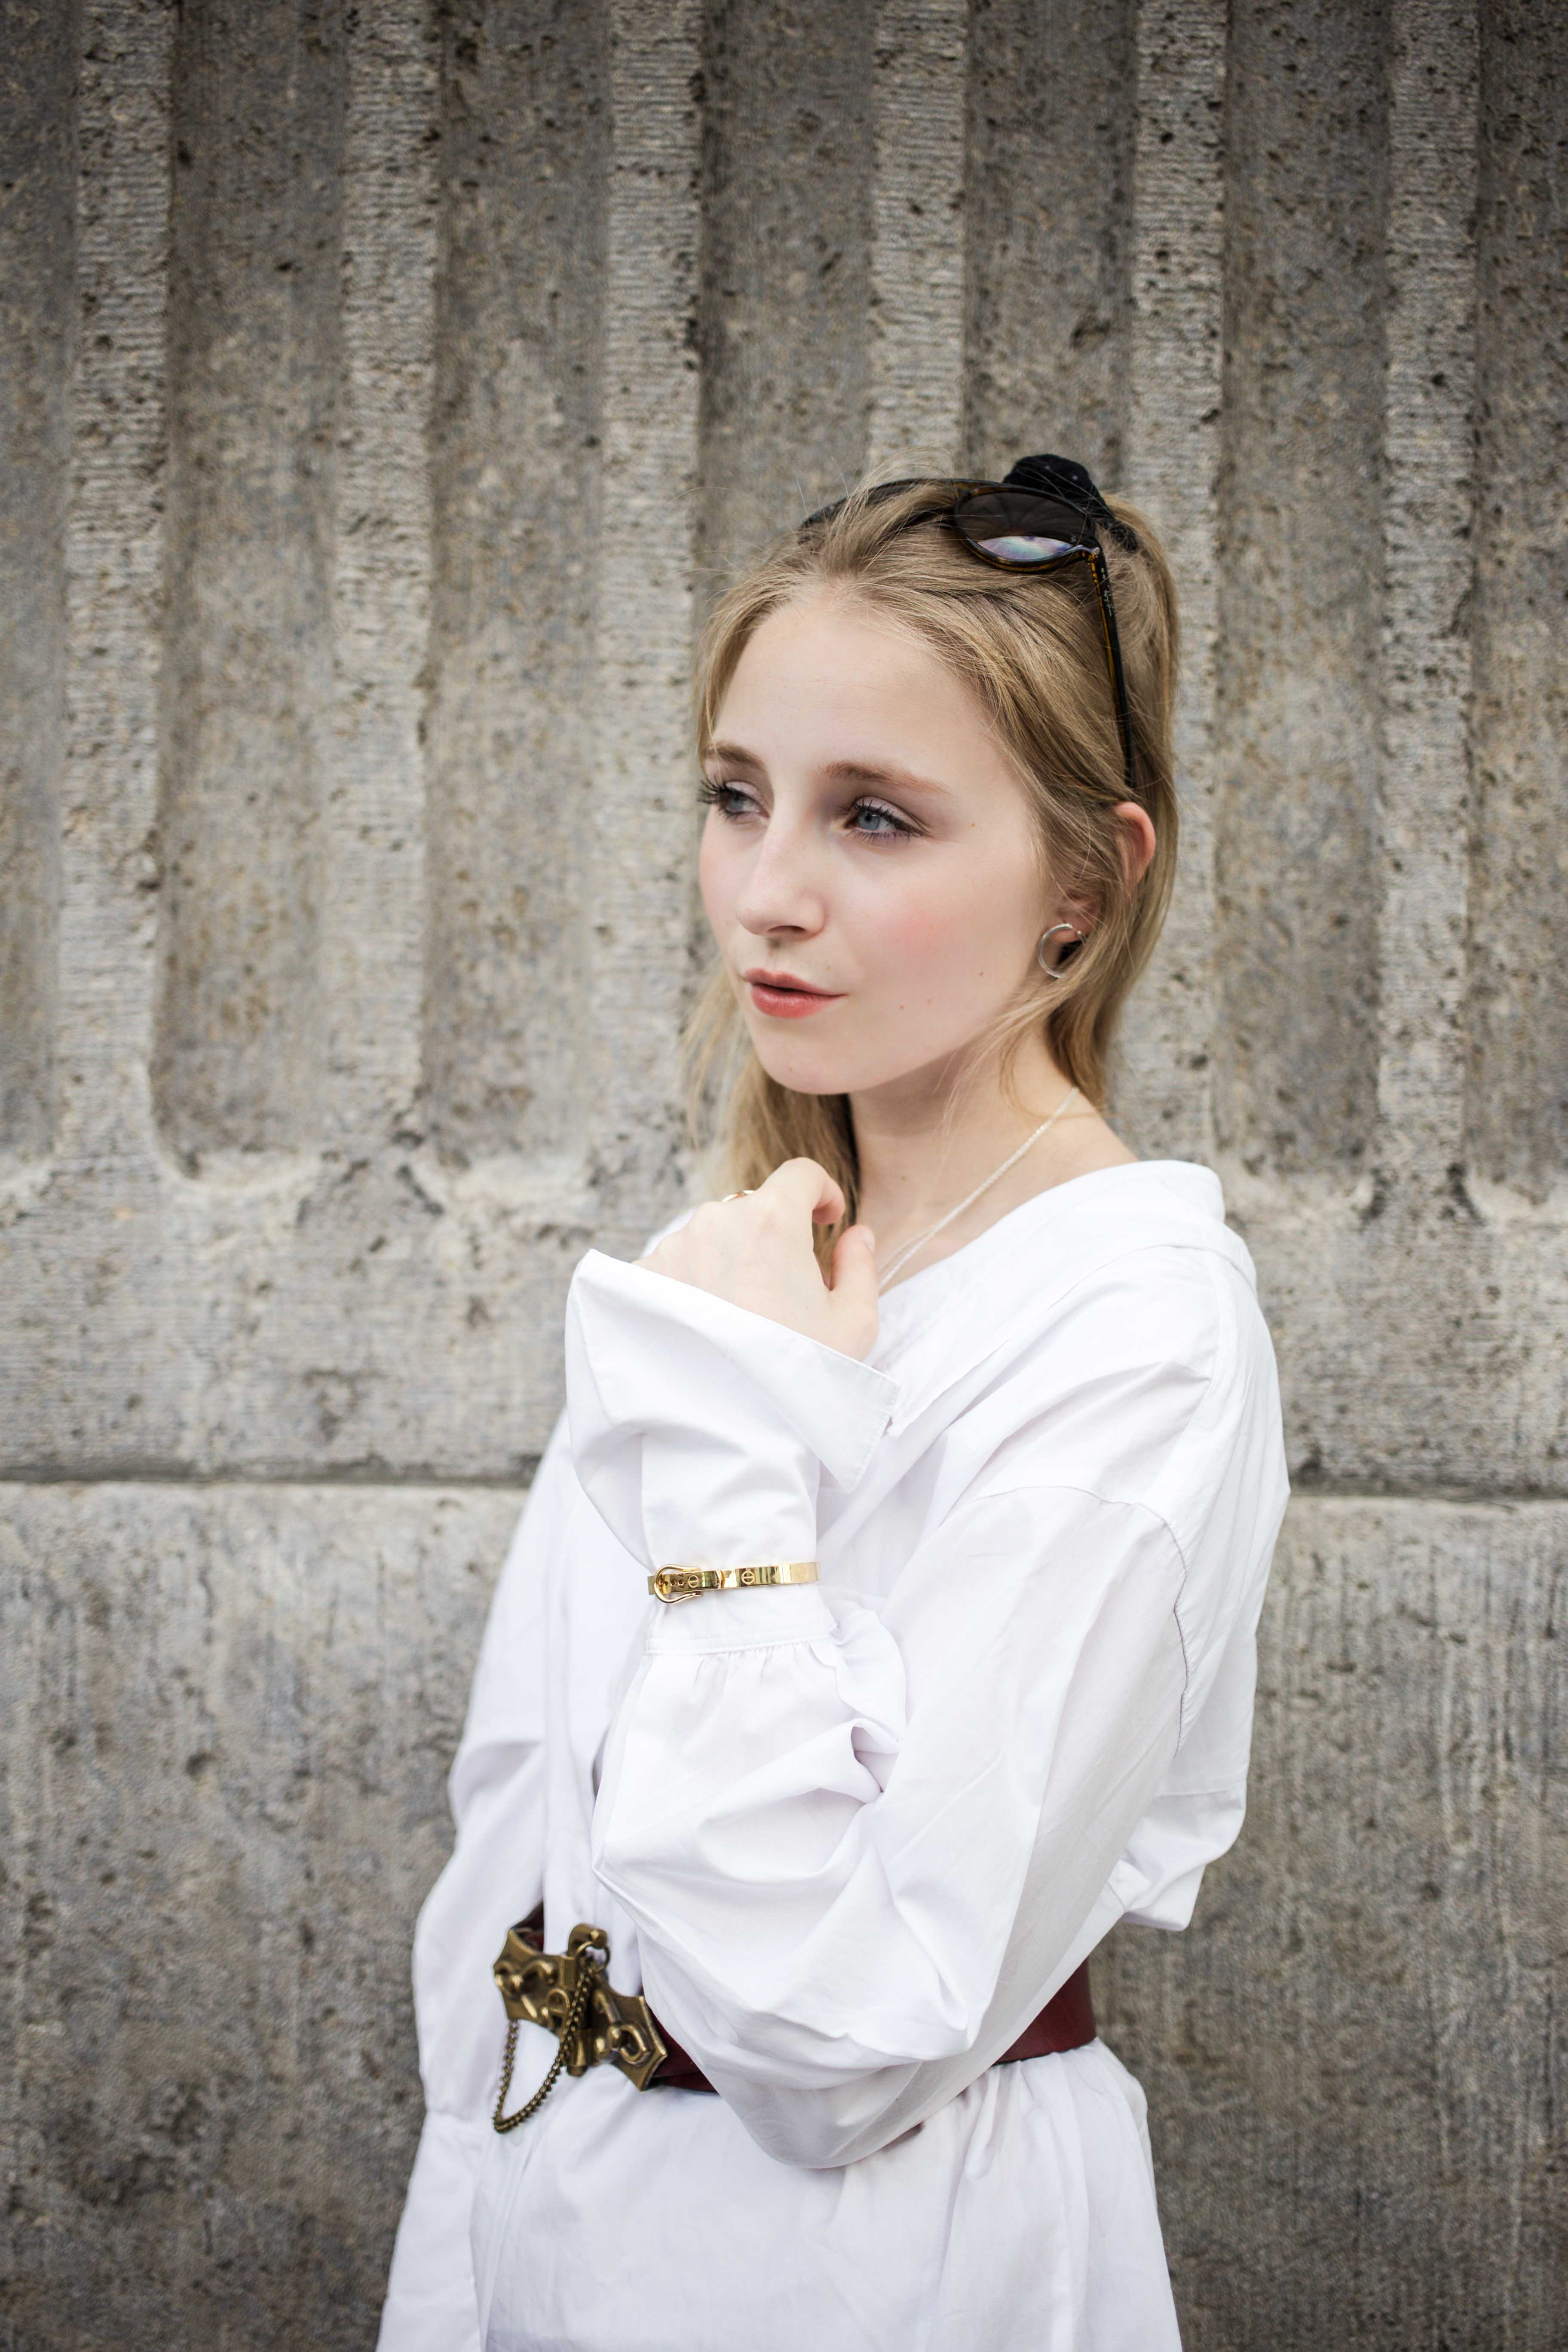 fashionweek-berlin-statement-gürtel-oversized-bluse-outfit-modeblog_6364